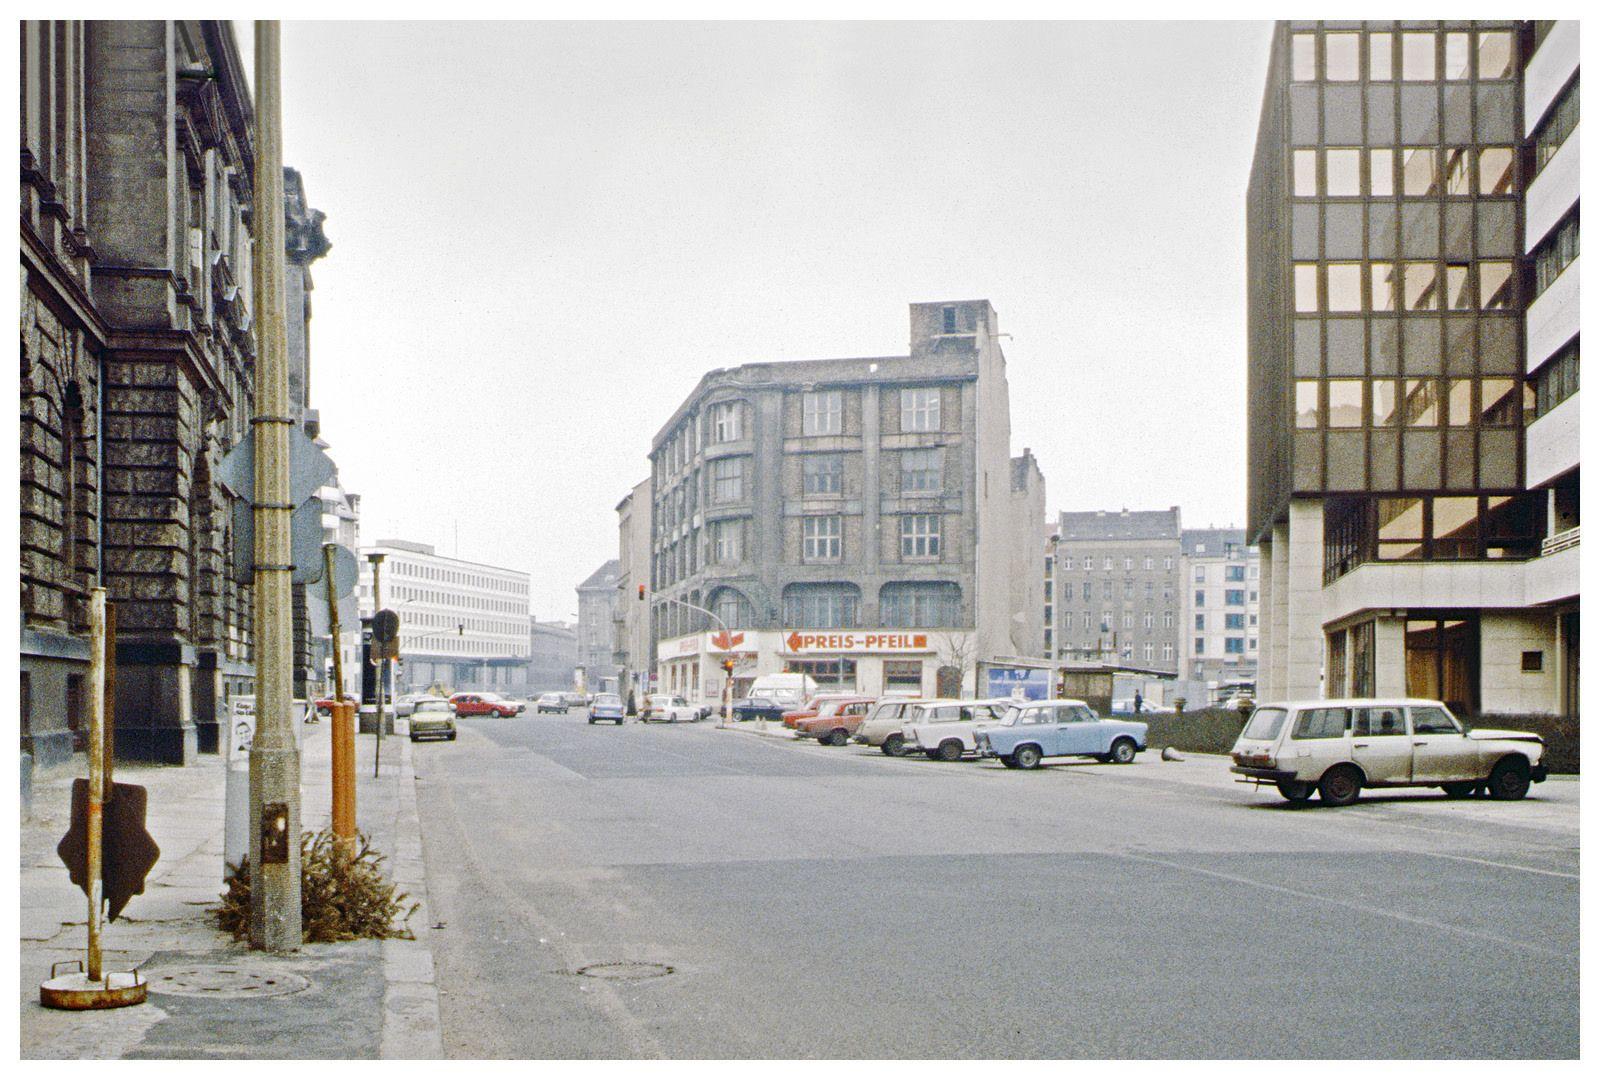 Mauerstraße | Berlin-Mitte 1991 | by S. Dekind